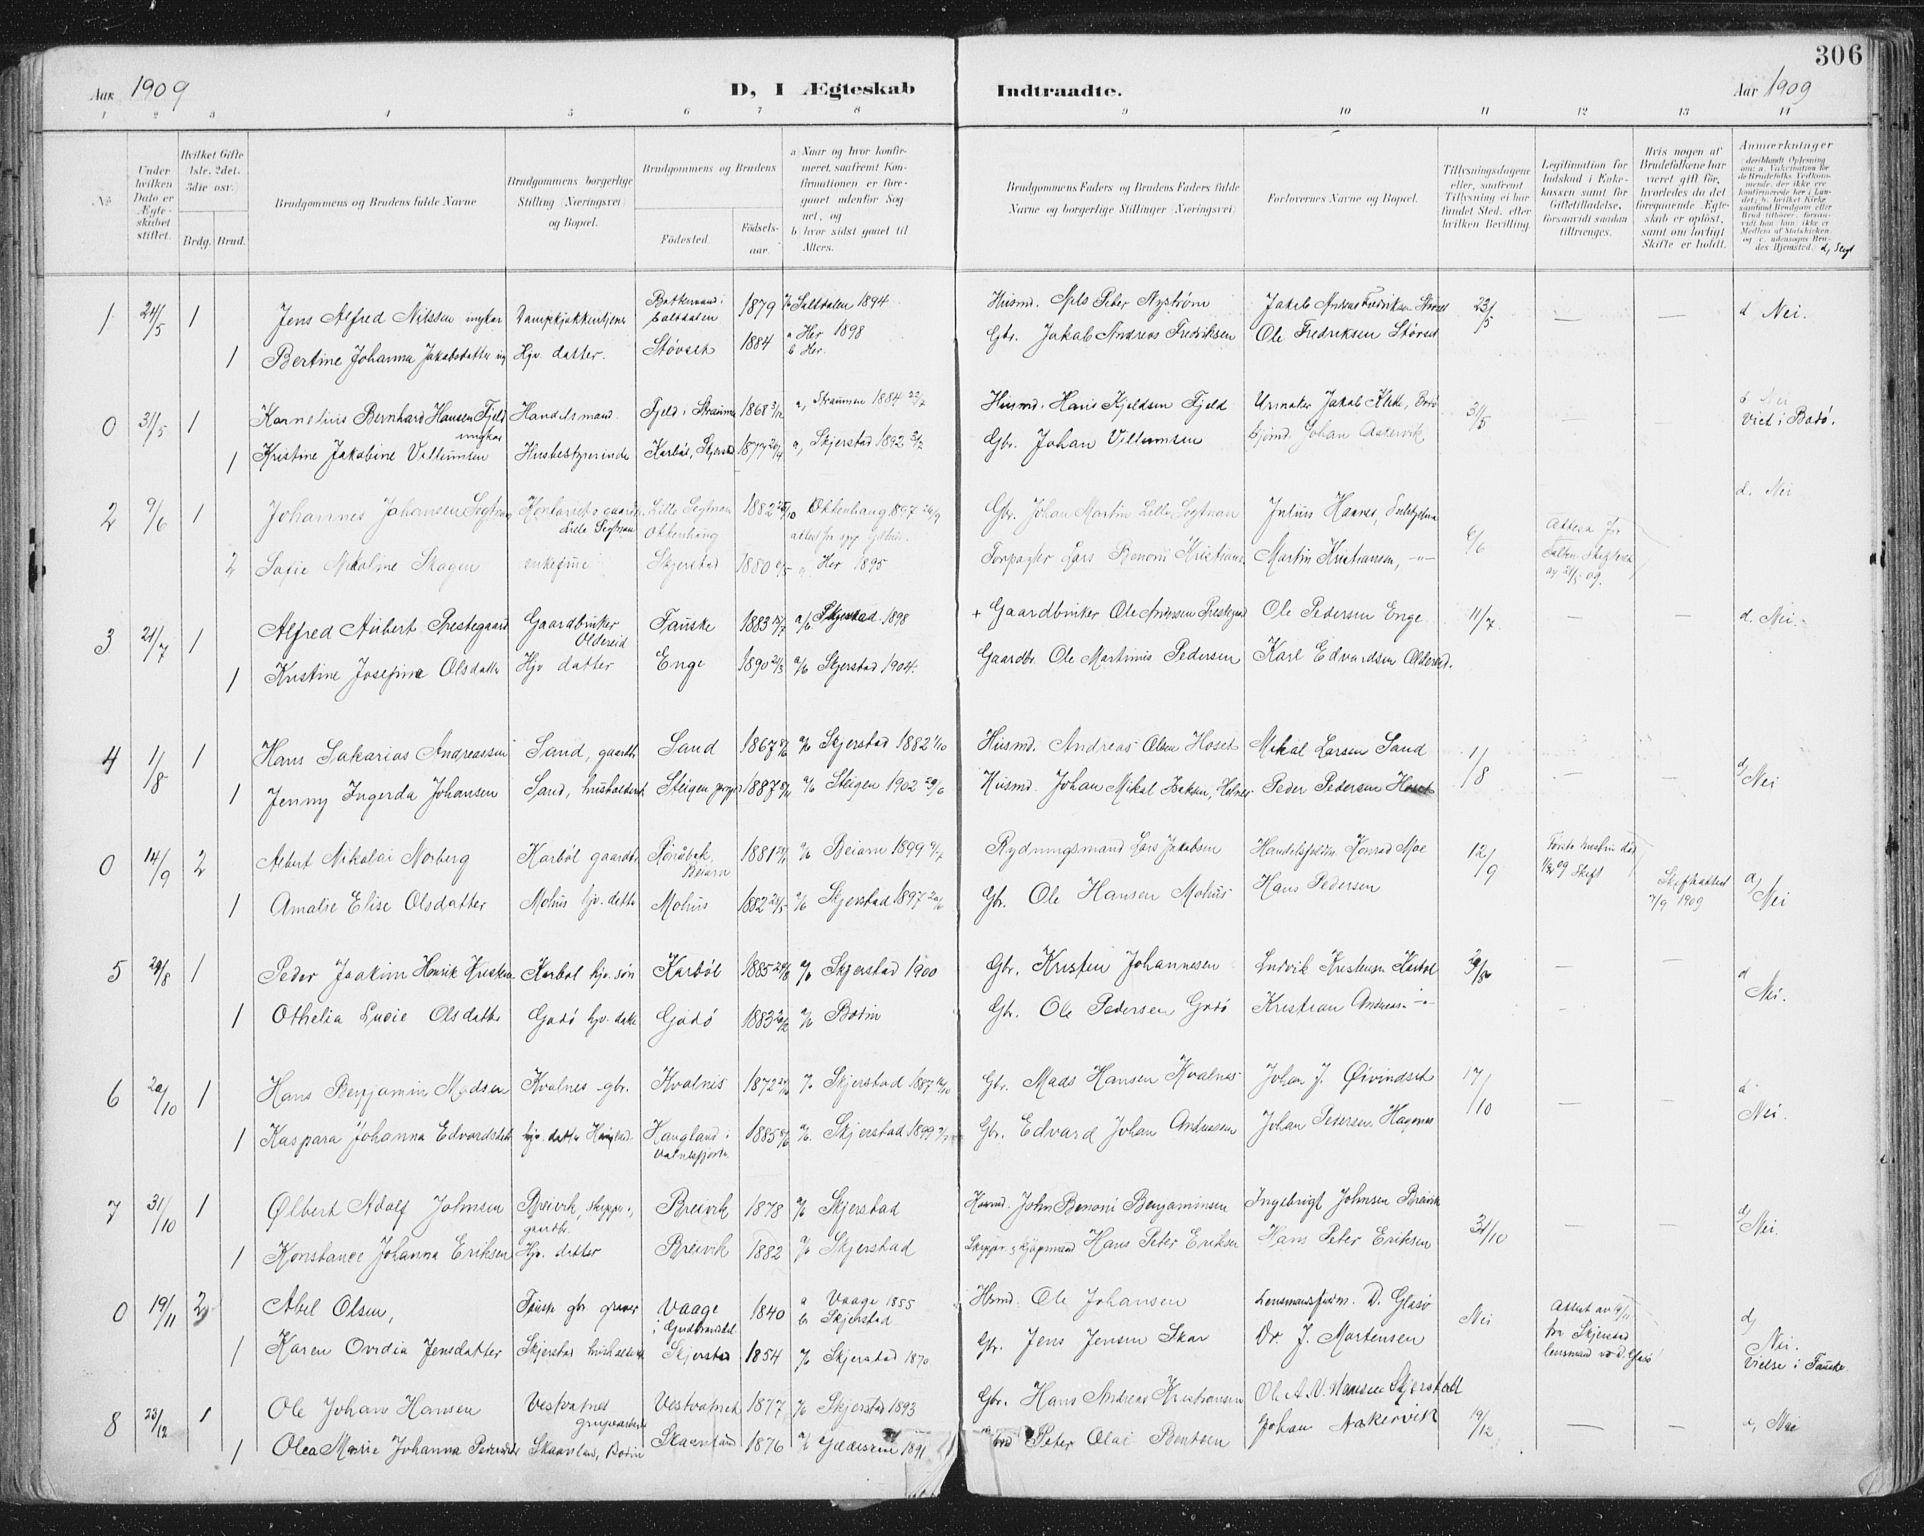 SAT, Ministerialprotokoller, klokkerbøker og fødselsregistre - Nordland, 852/L0741: Ministerialbok nr. 852A11, 1894-1917, s. 306